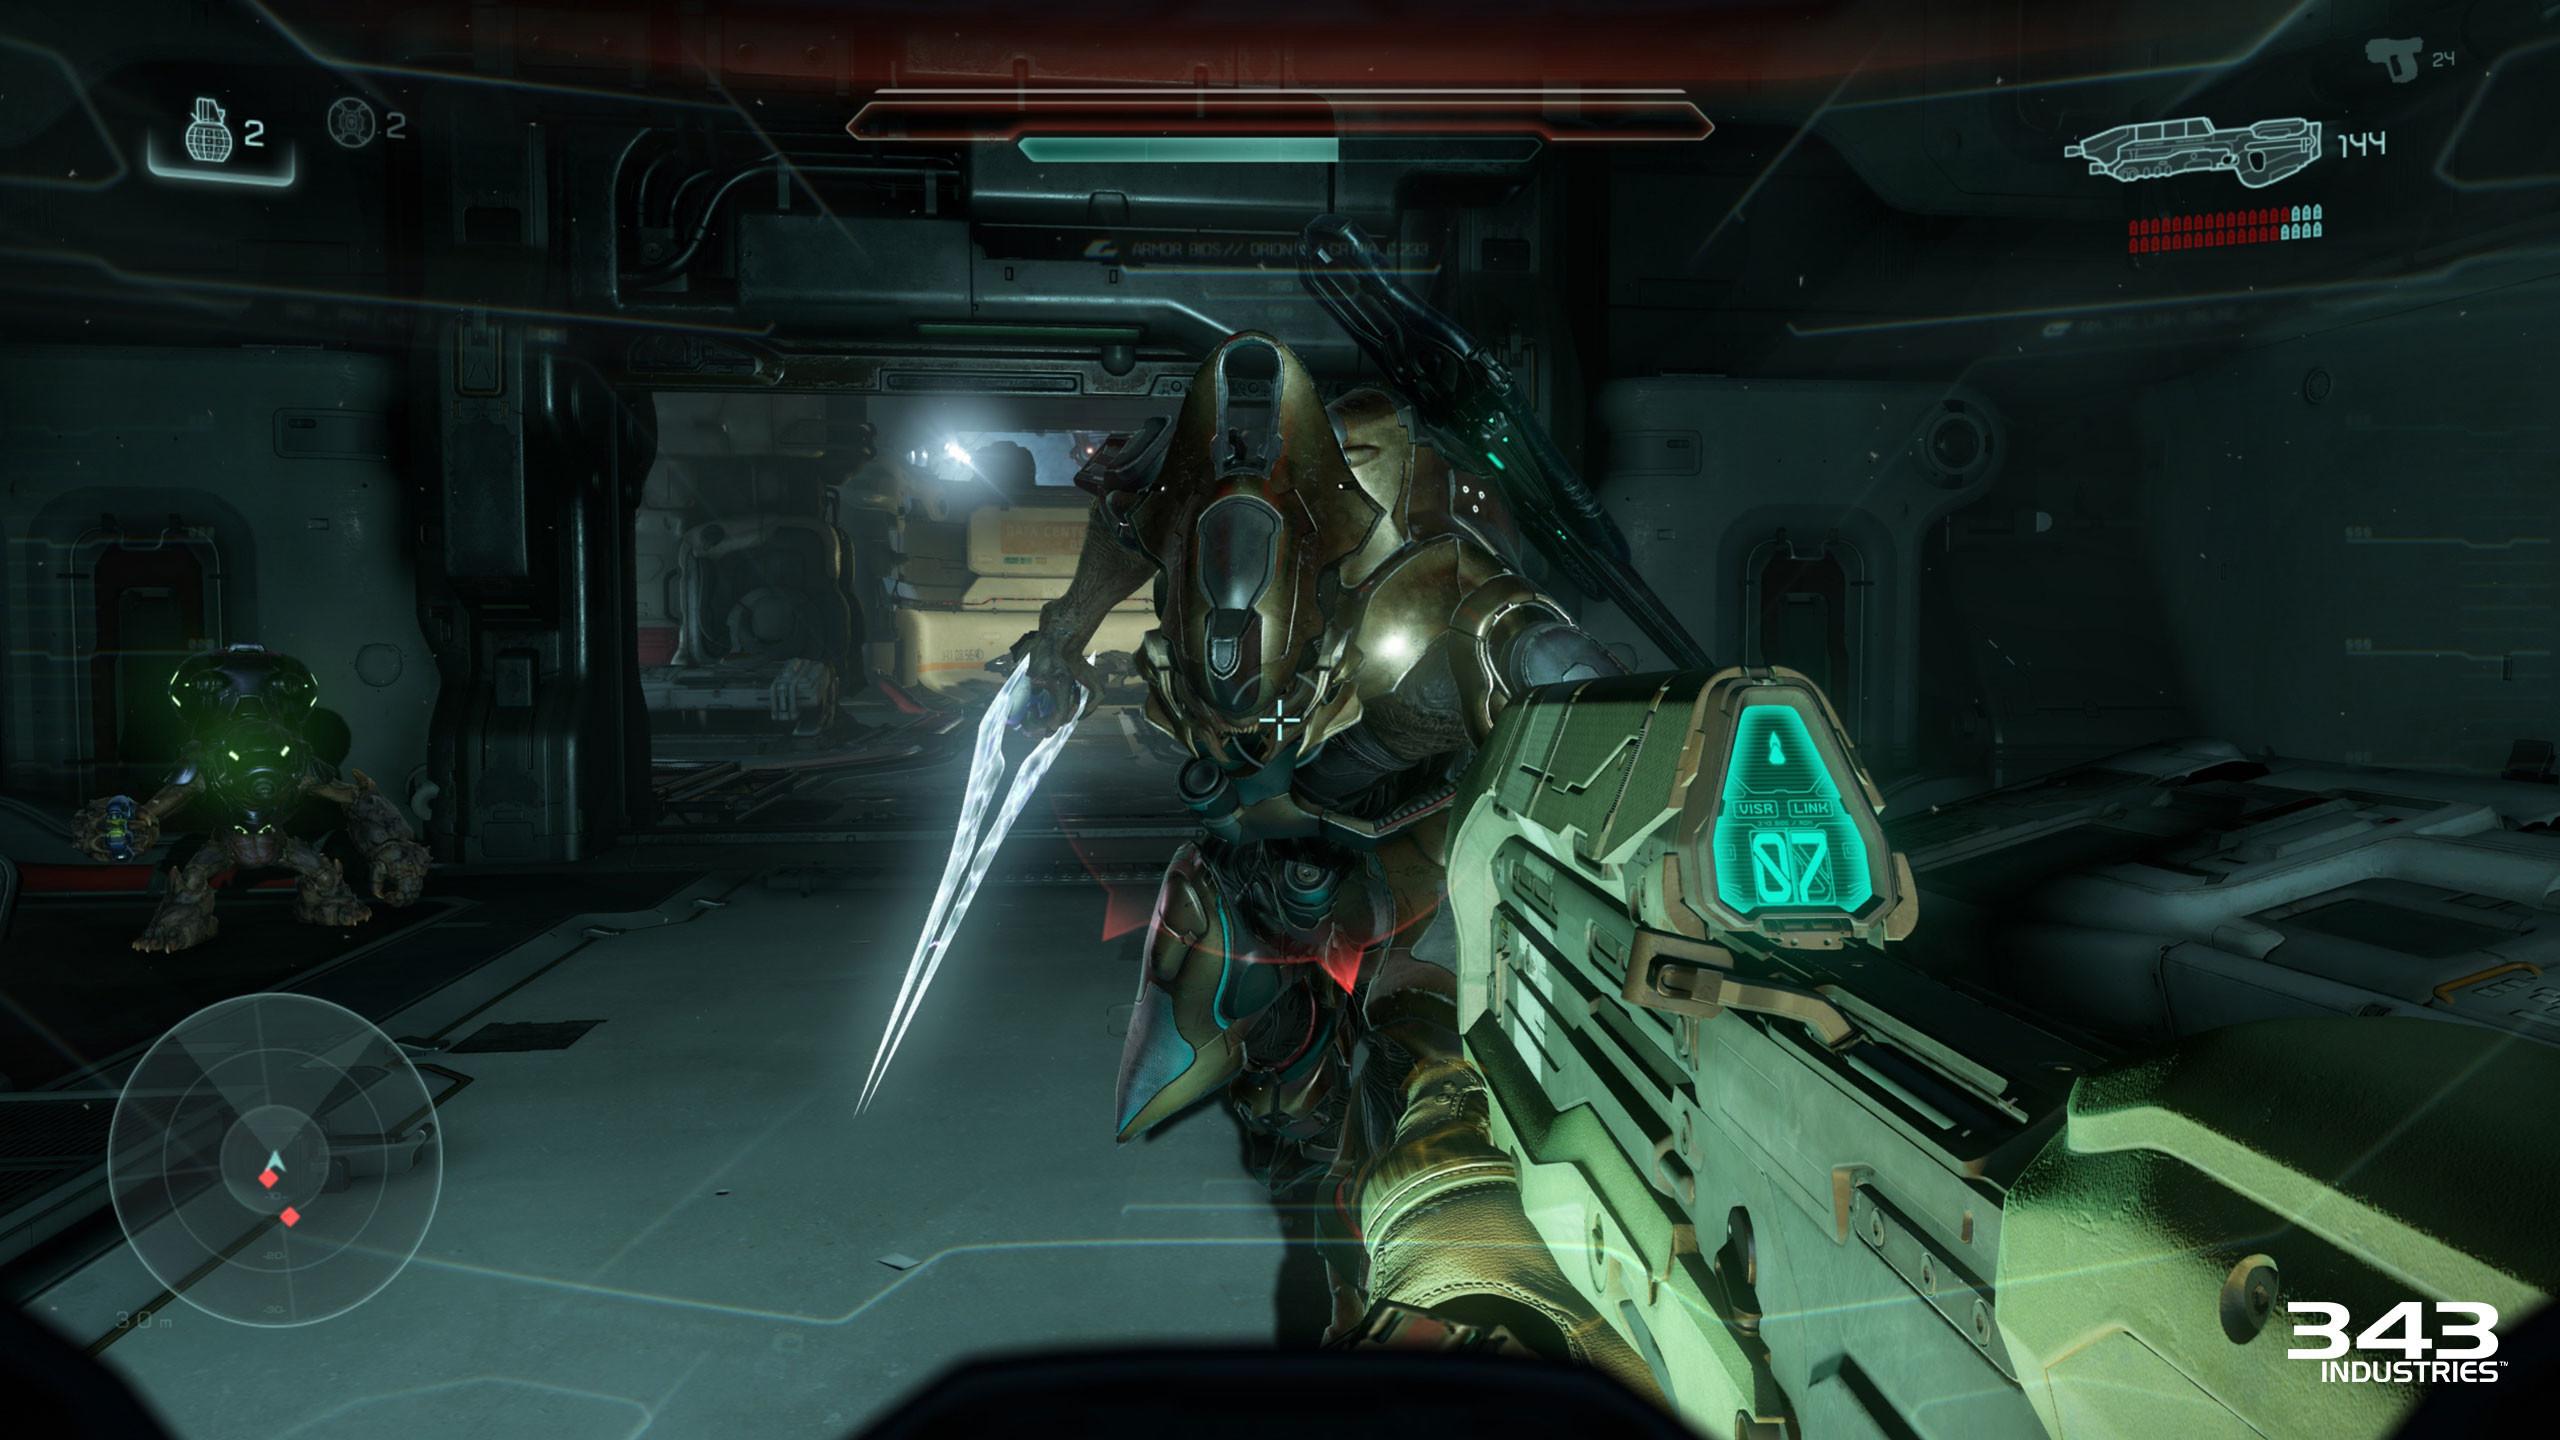 … Halo 5 Jul's Elites, …